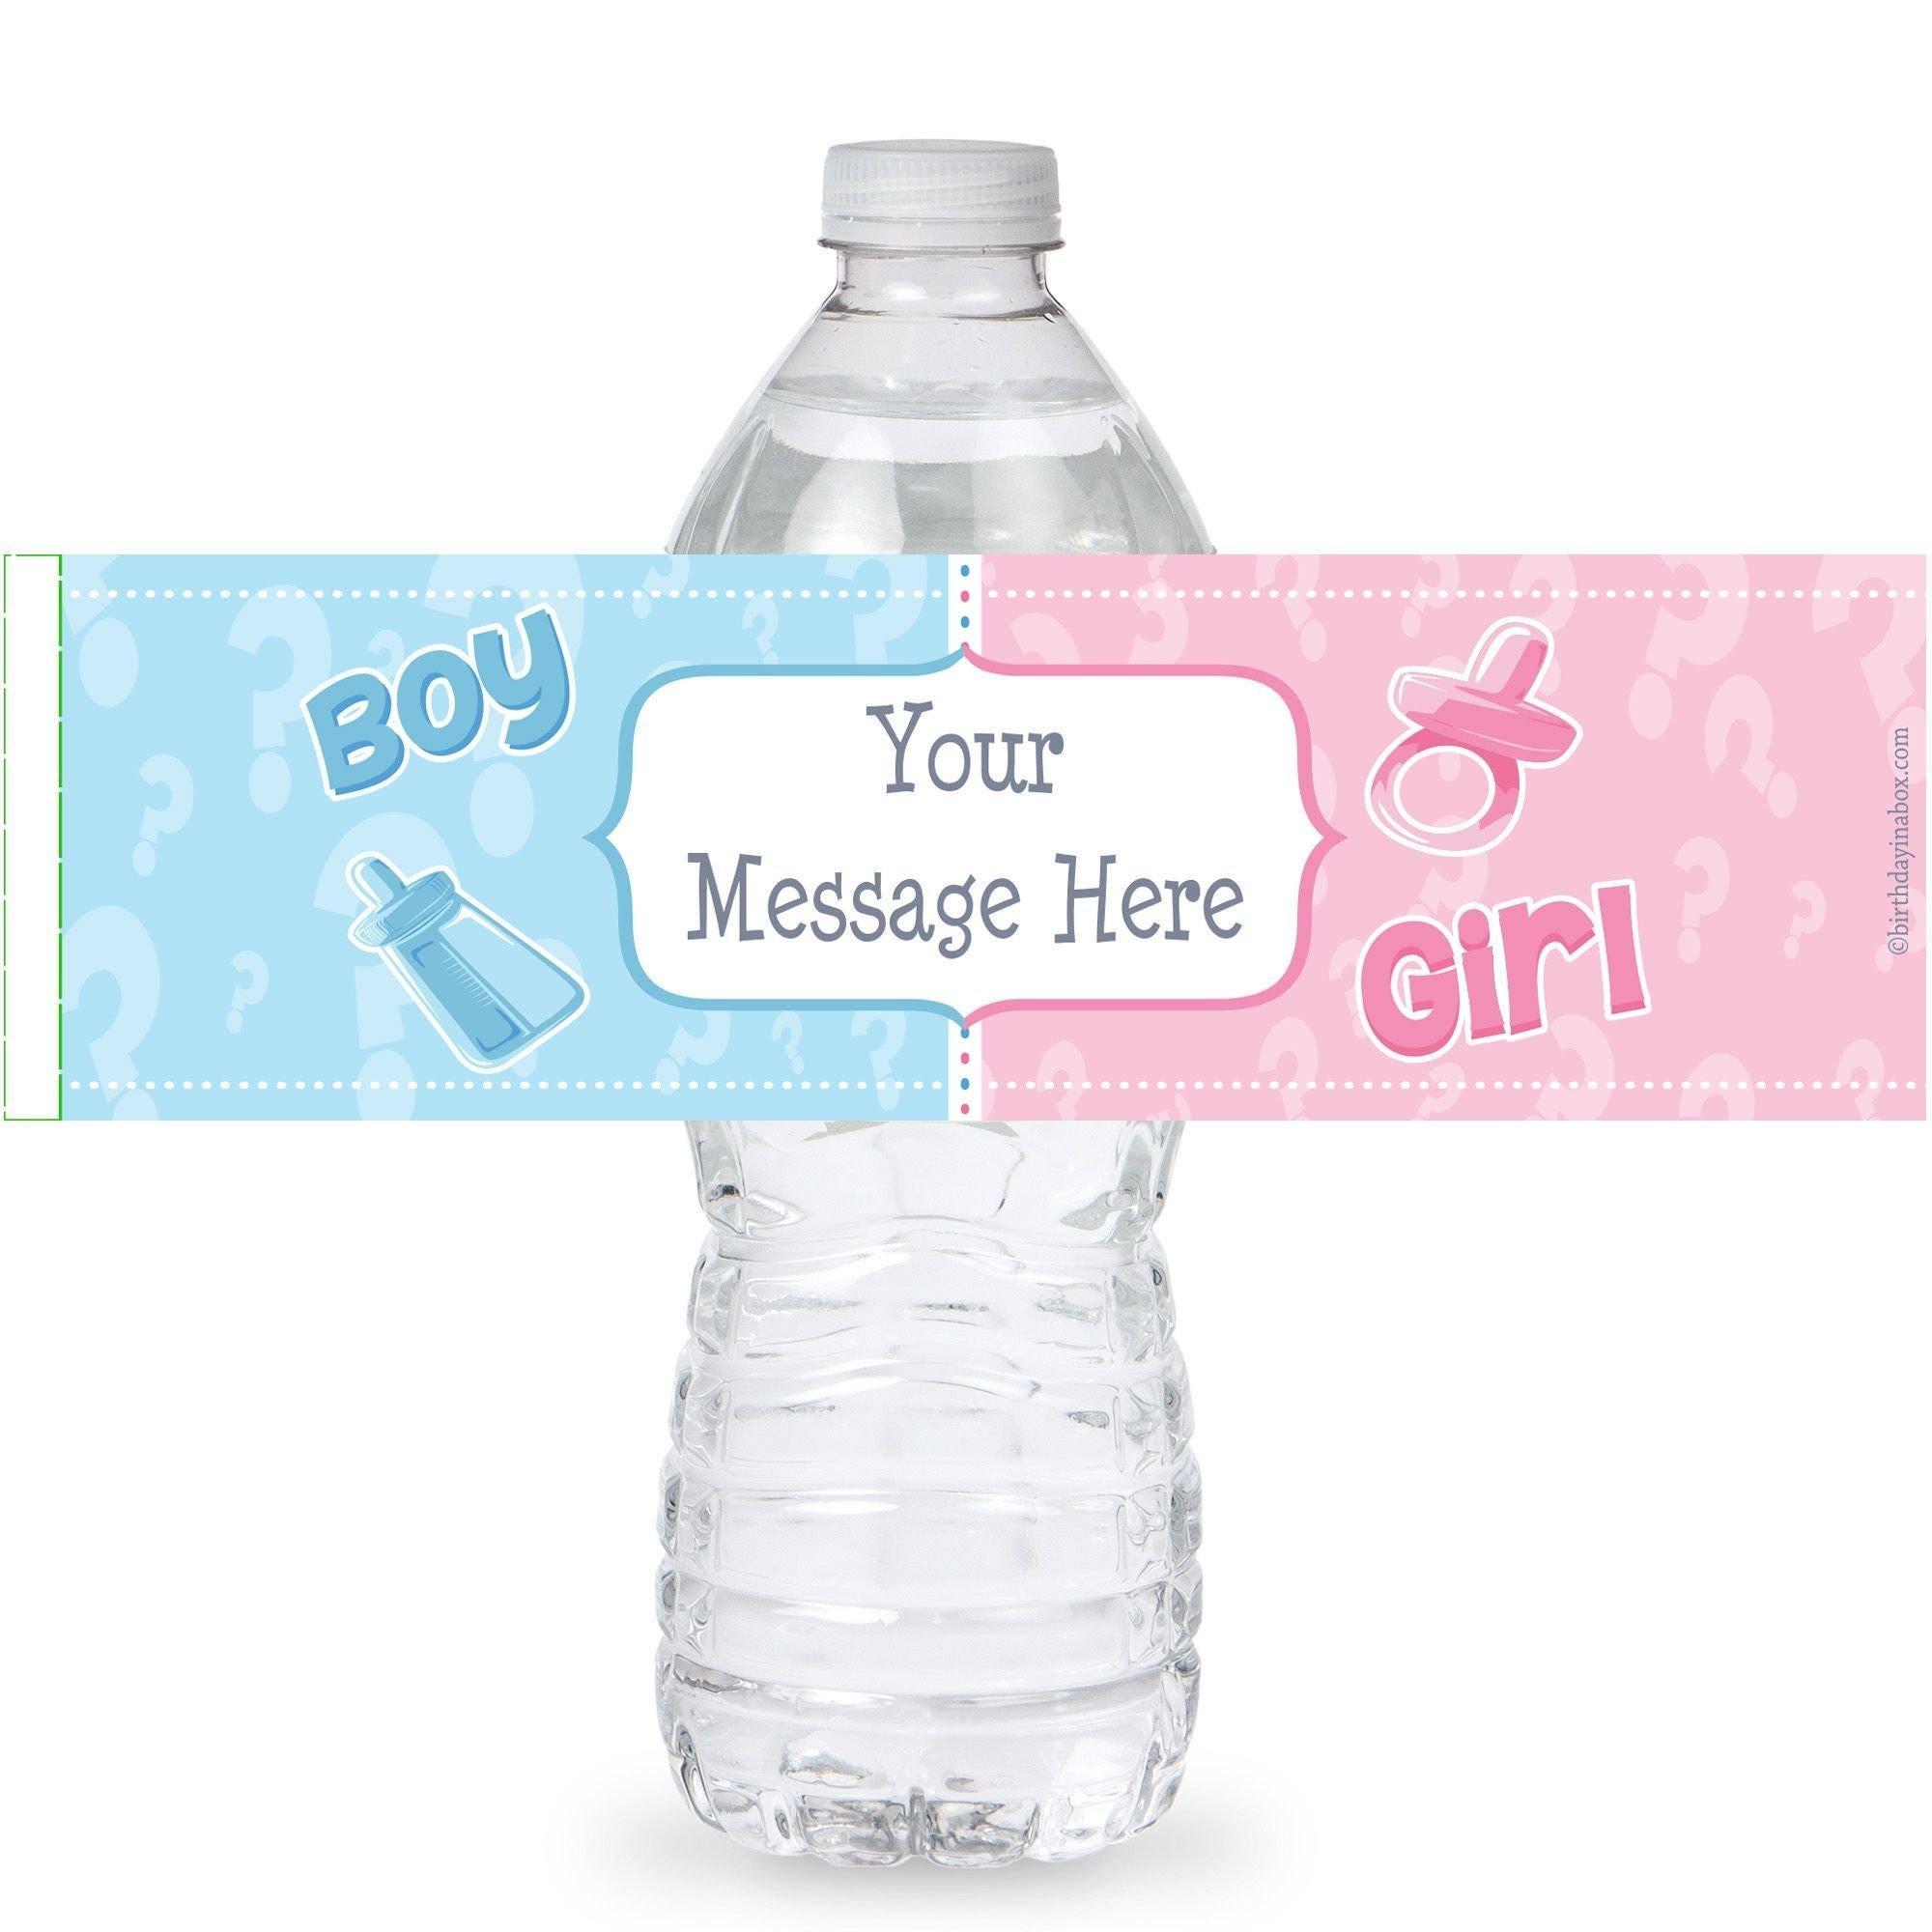 Personalized Gender Reveal Water Bottle Labels Self